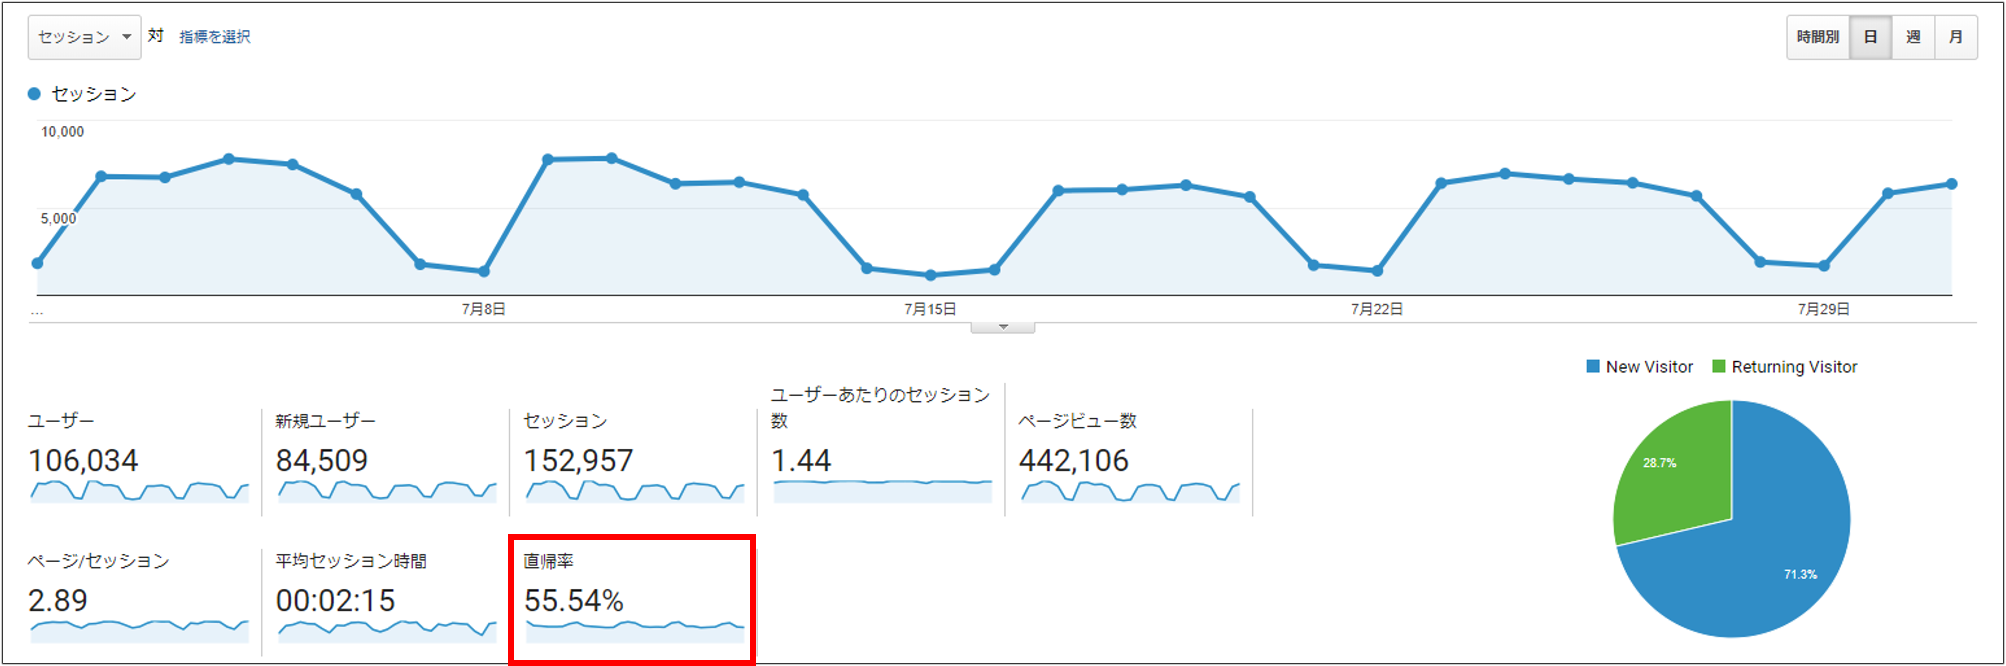 Google Analyticsのスクリーンショット